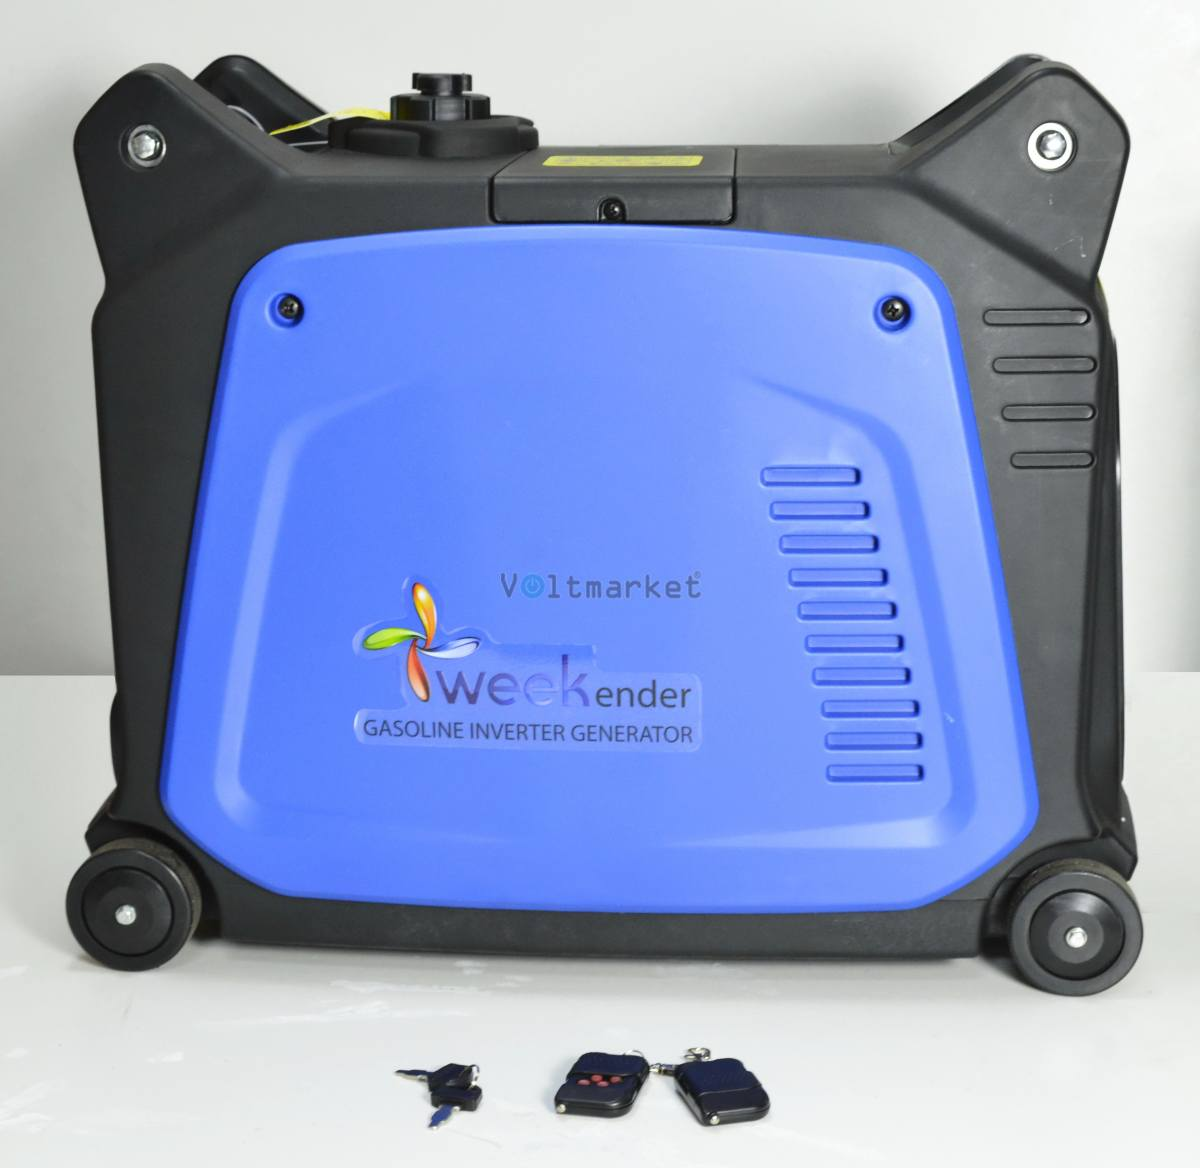 Инверторный бензогенератор Weekender X2600ie